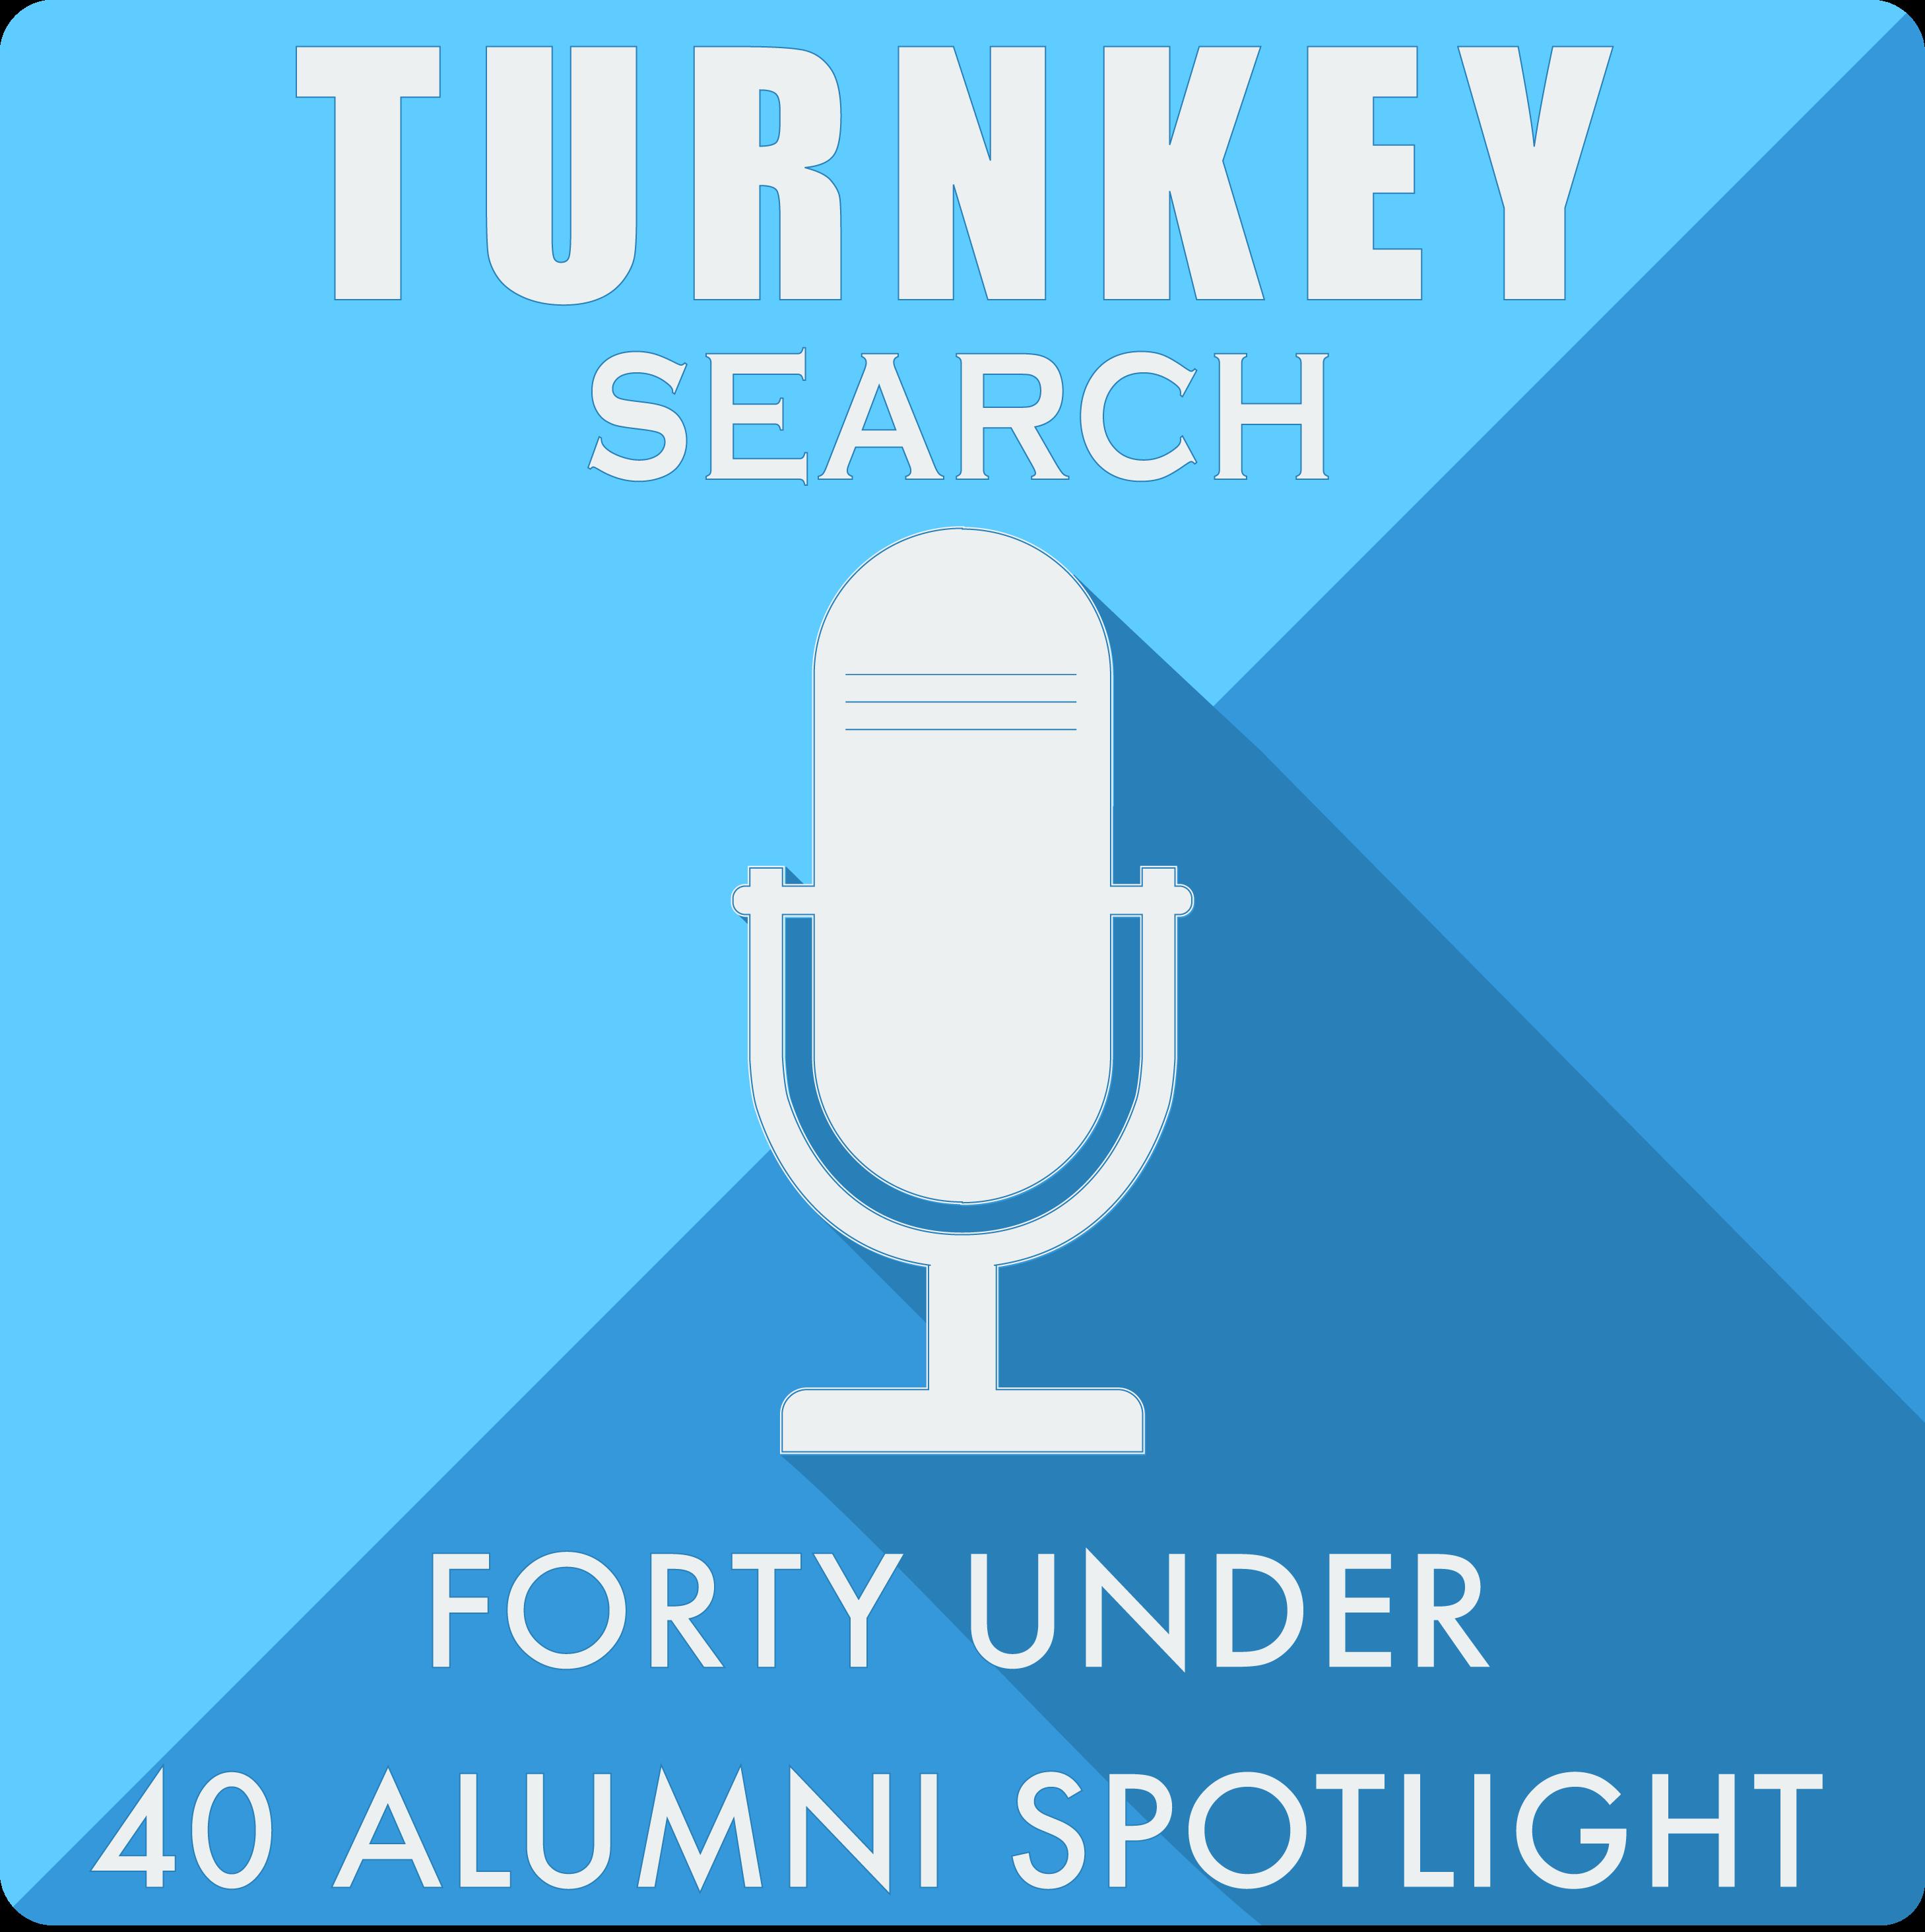 Turnkey Search Forty Under 40 Alumni Spotlight